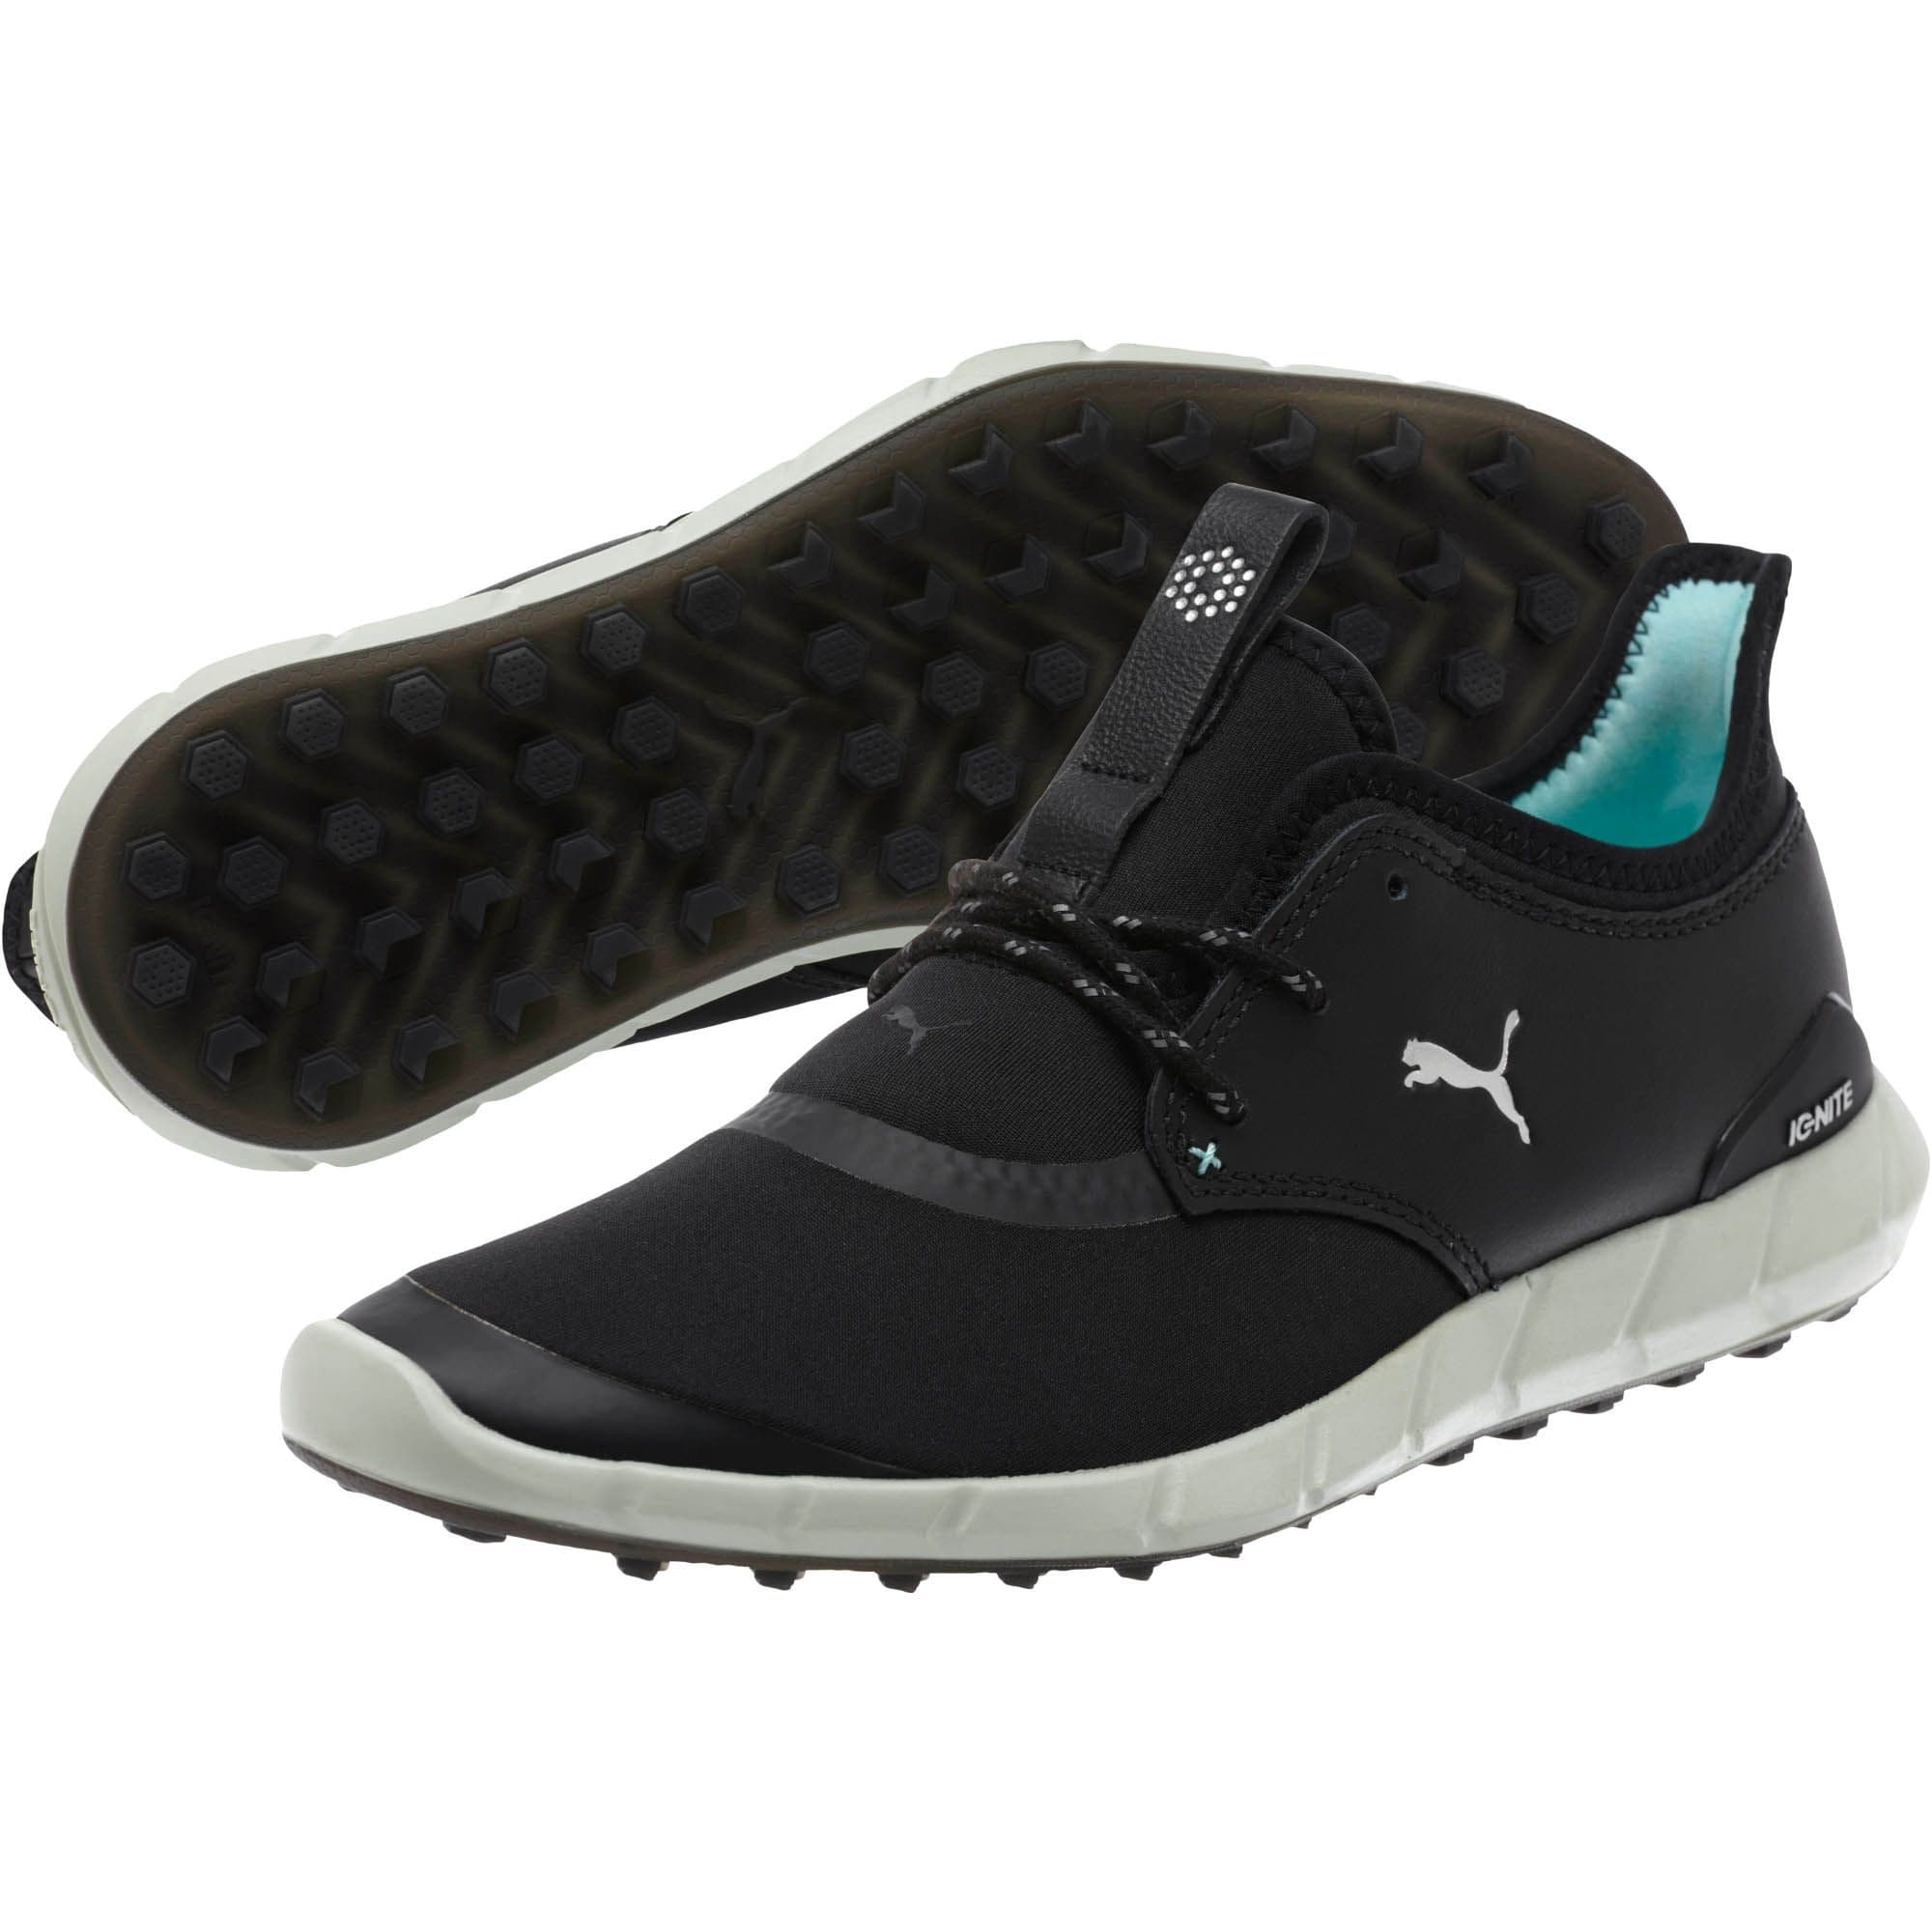 818460f26d2f Shop Puma Women s Ignite Spikeless Sport Golf Shoes Black Silver Aruba Blue  189422-01 - Free Shipping Today - Overstock - 22678215